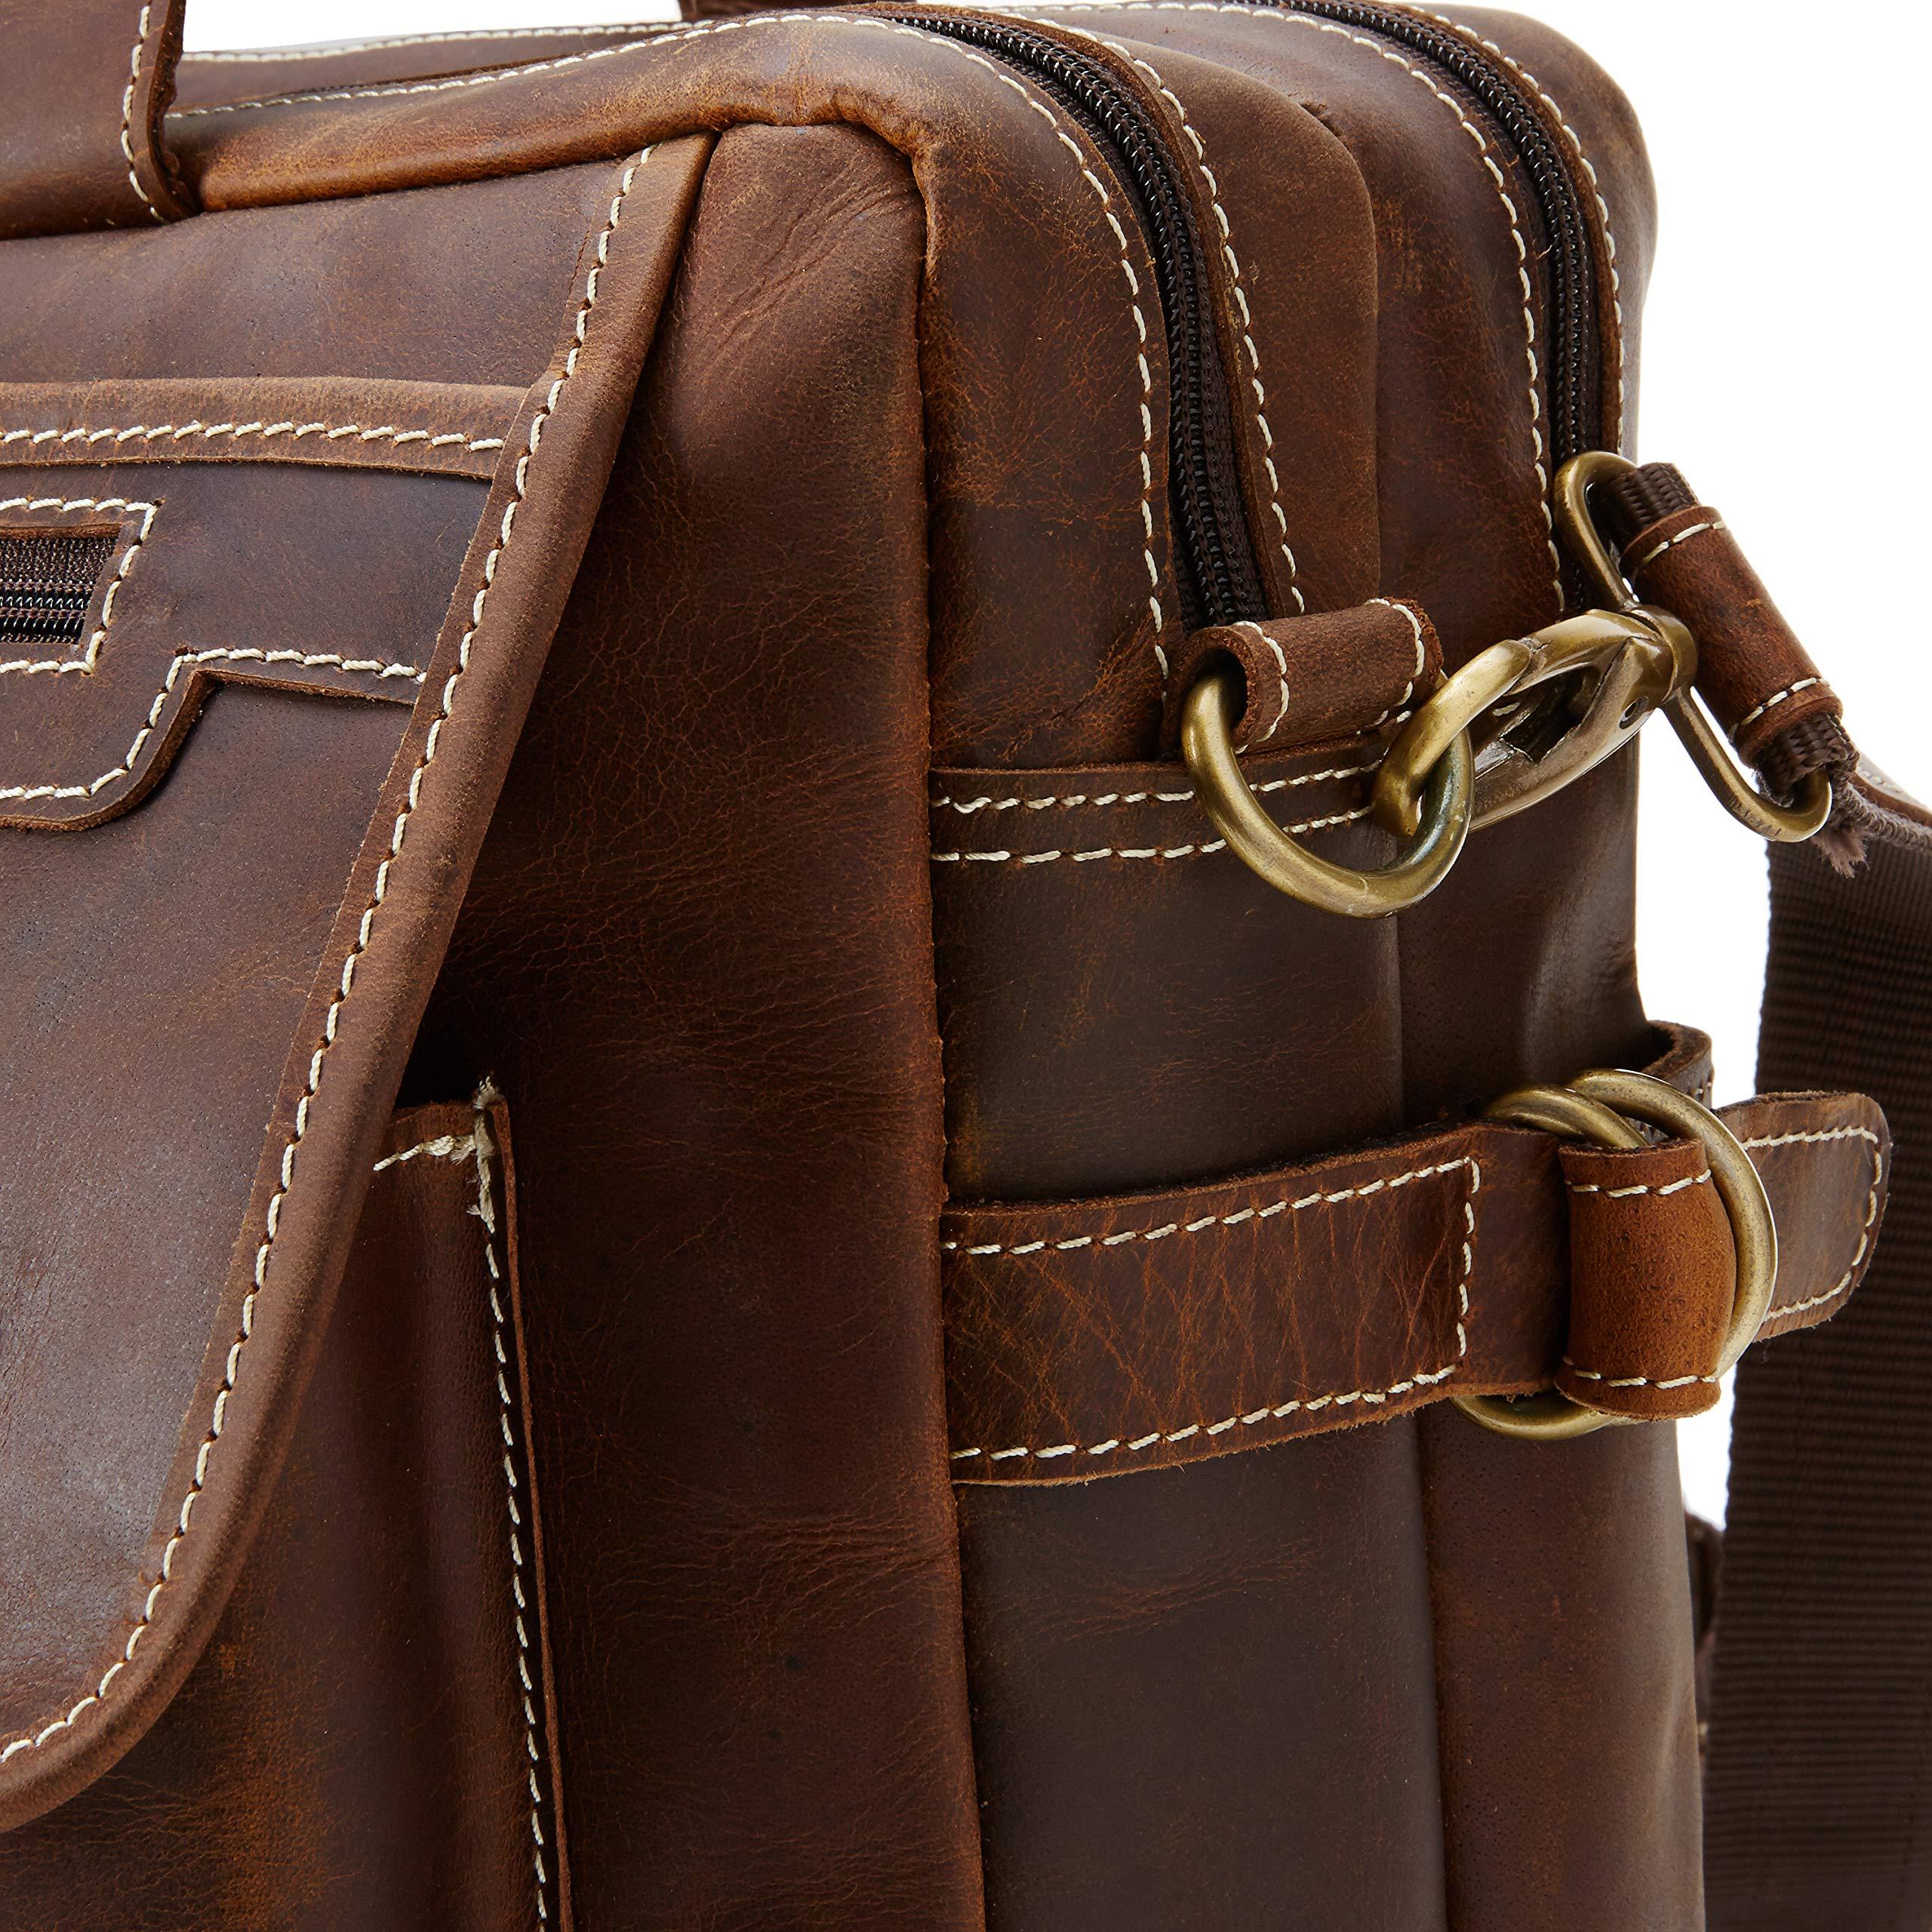 16 inch Vintage Buffalo Leather Messenger Satchel Laptop Briefcase Men's Bag Crazy Vintage Leather Messenger (Brown) by Ruzioon (Image #3)